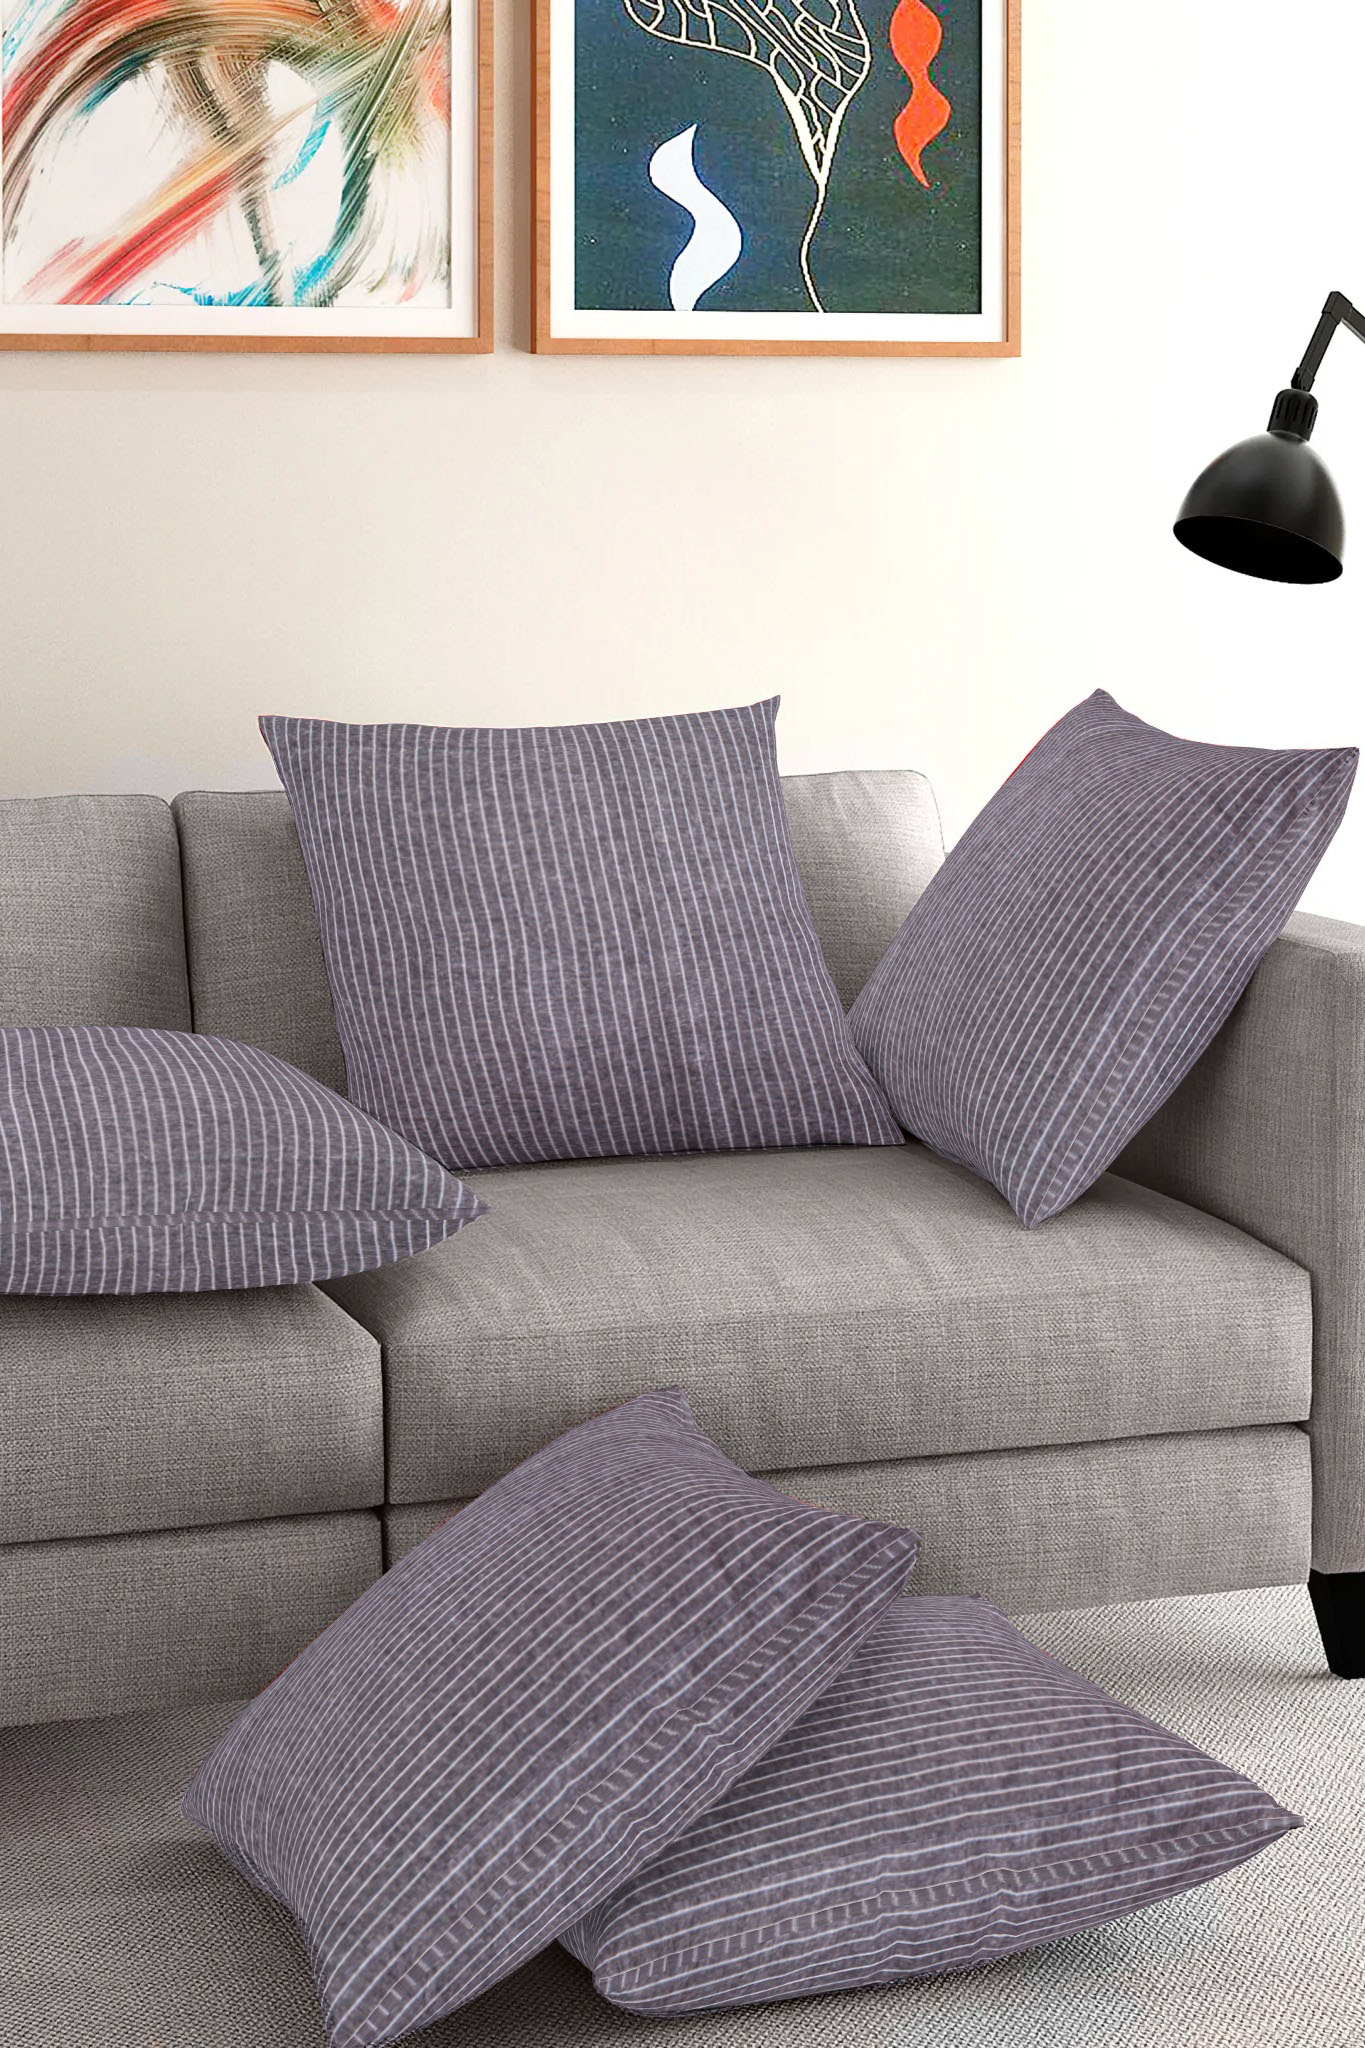 /home/customer/www/fabartcraft.com/public_html/uploadshttps://www.shopolics.com/uploads/images/medium/Gray-White-Cotton-Cushion-Cover-35393.jpg